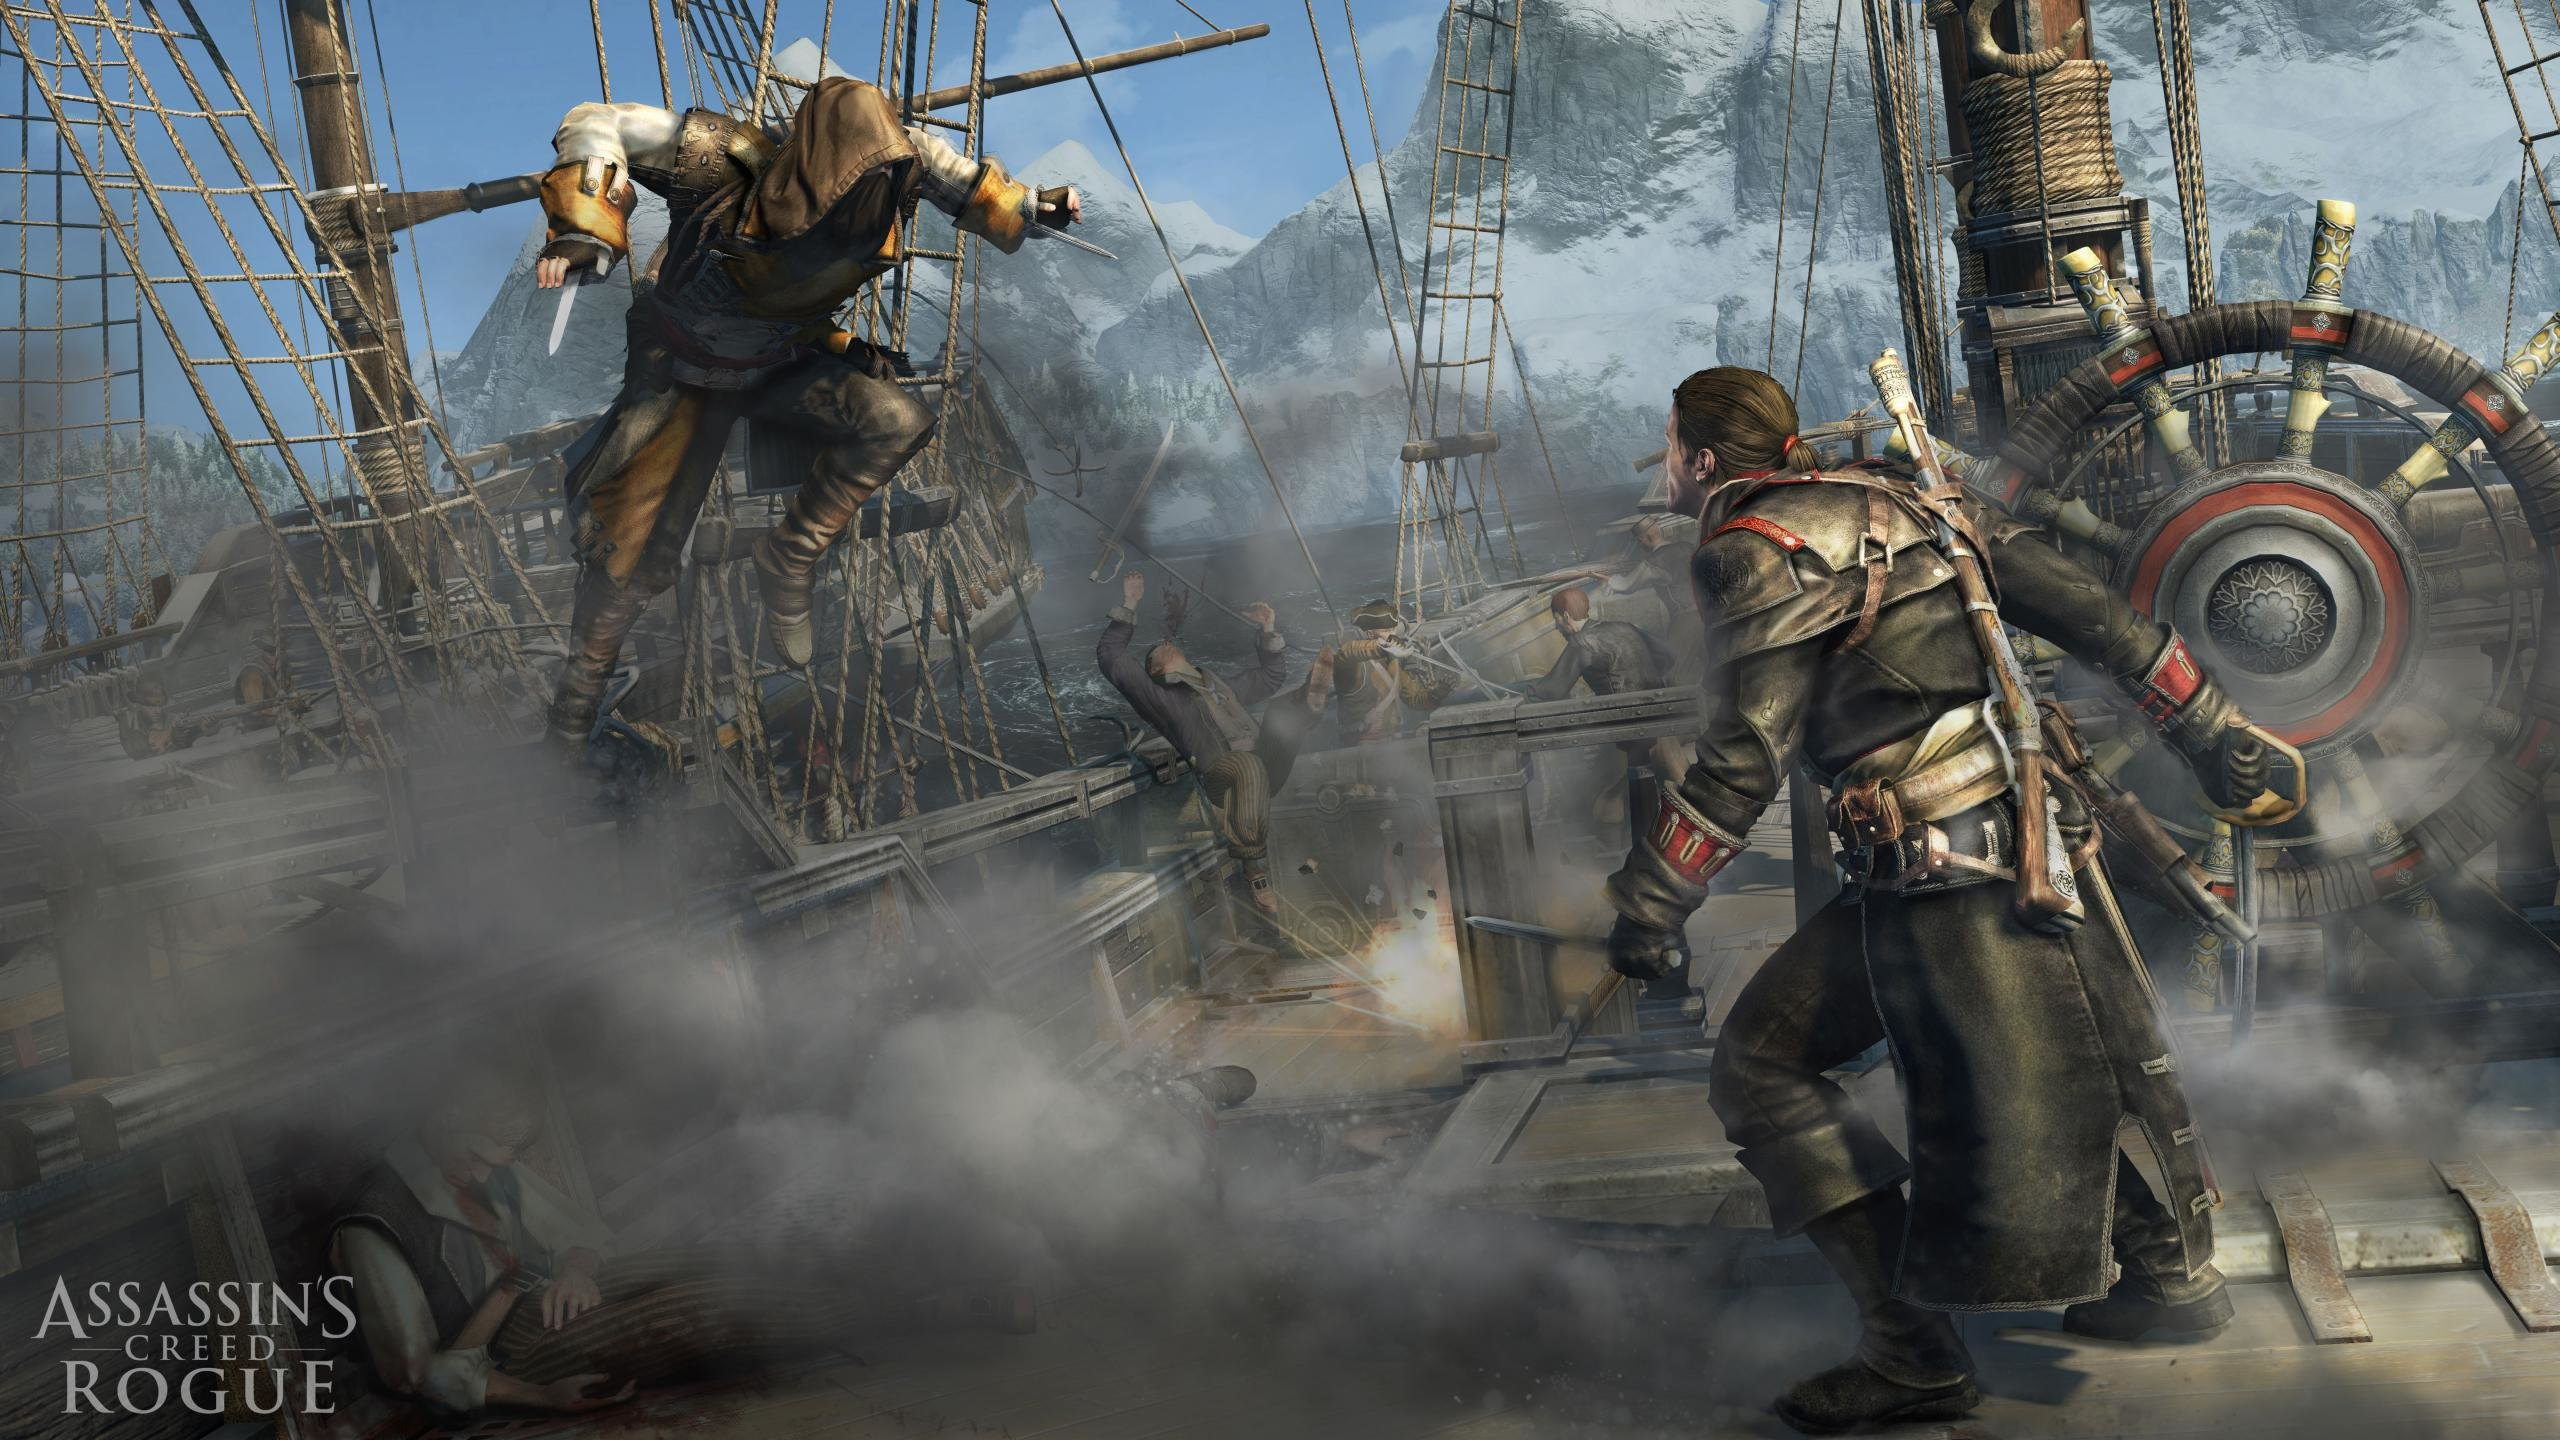 High Resolution Assassin S Creed Rogue Hd 2560x1440 Wallpaper Id